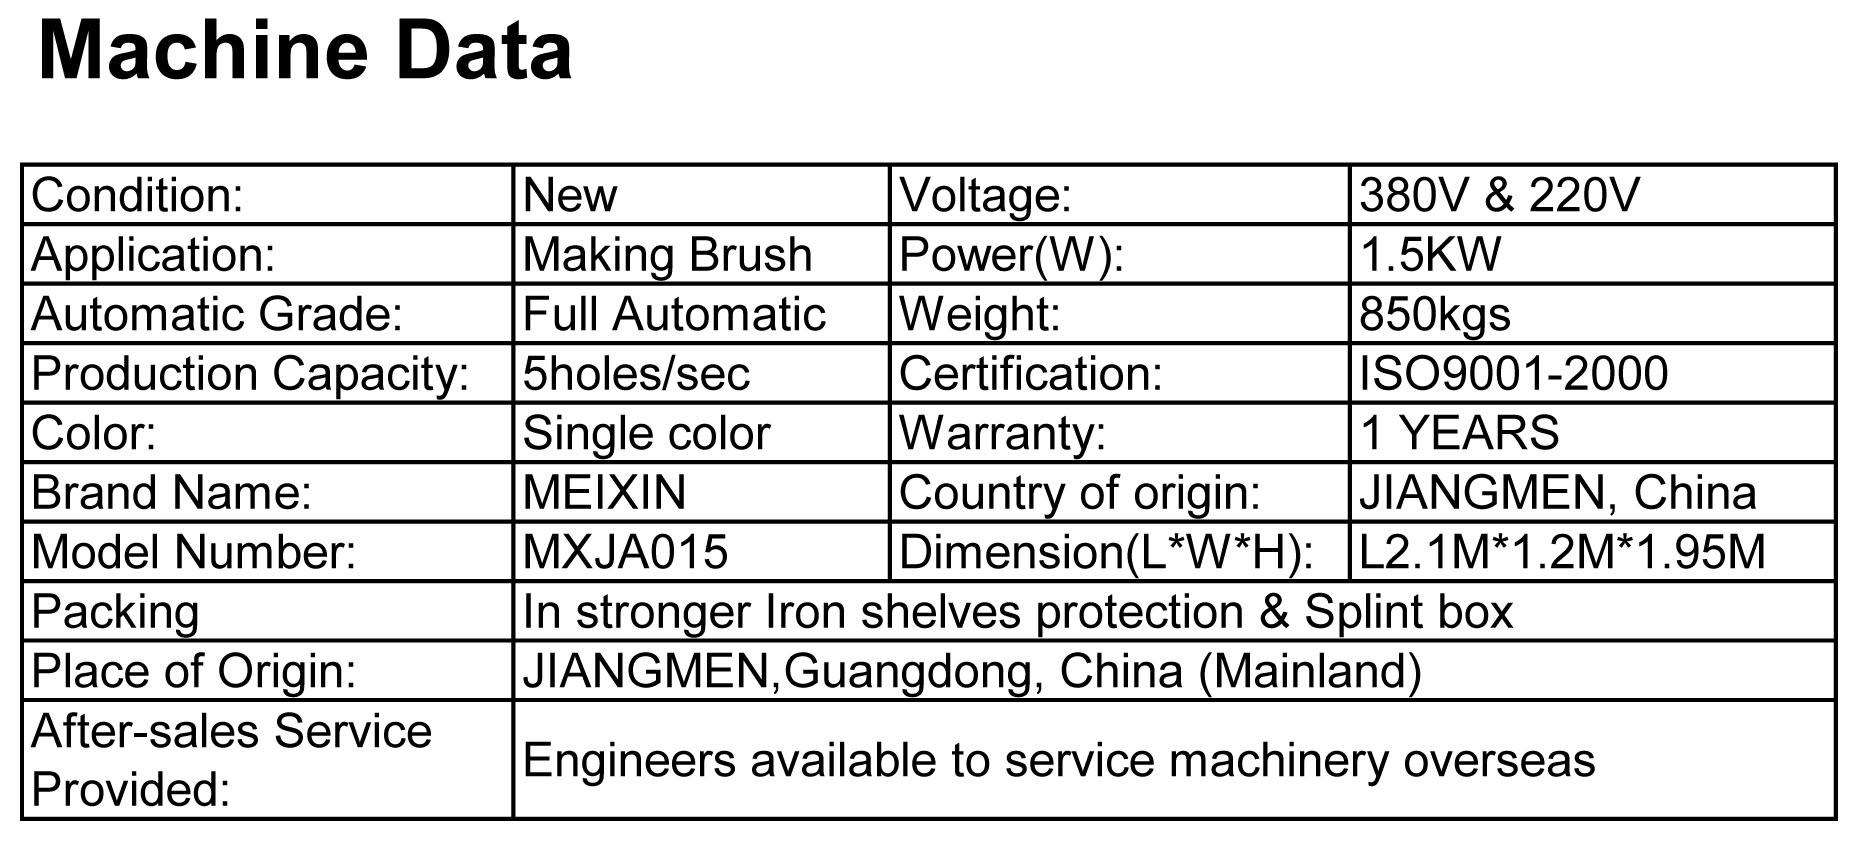 Meixin-Professional Paint Brush Cleaner Machine Makeup Brush Washing Machine Supplier